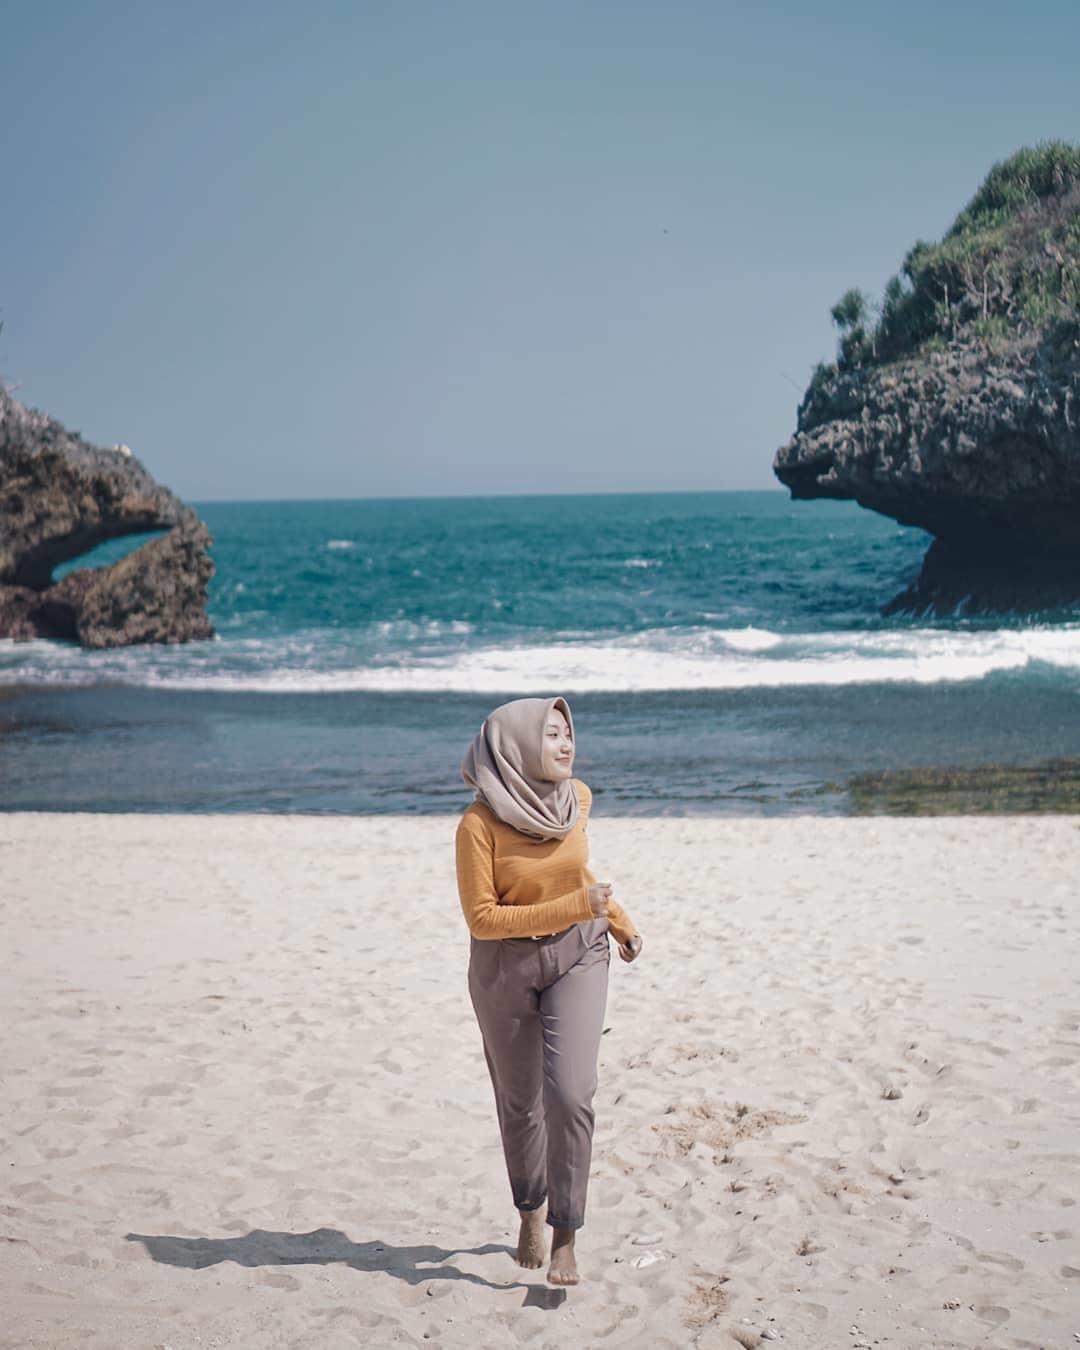 Misteri Pantai Sedahan Gunung Kidul